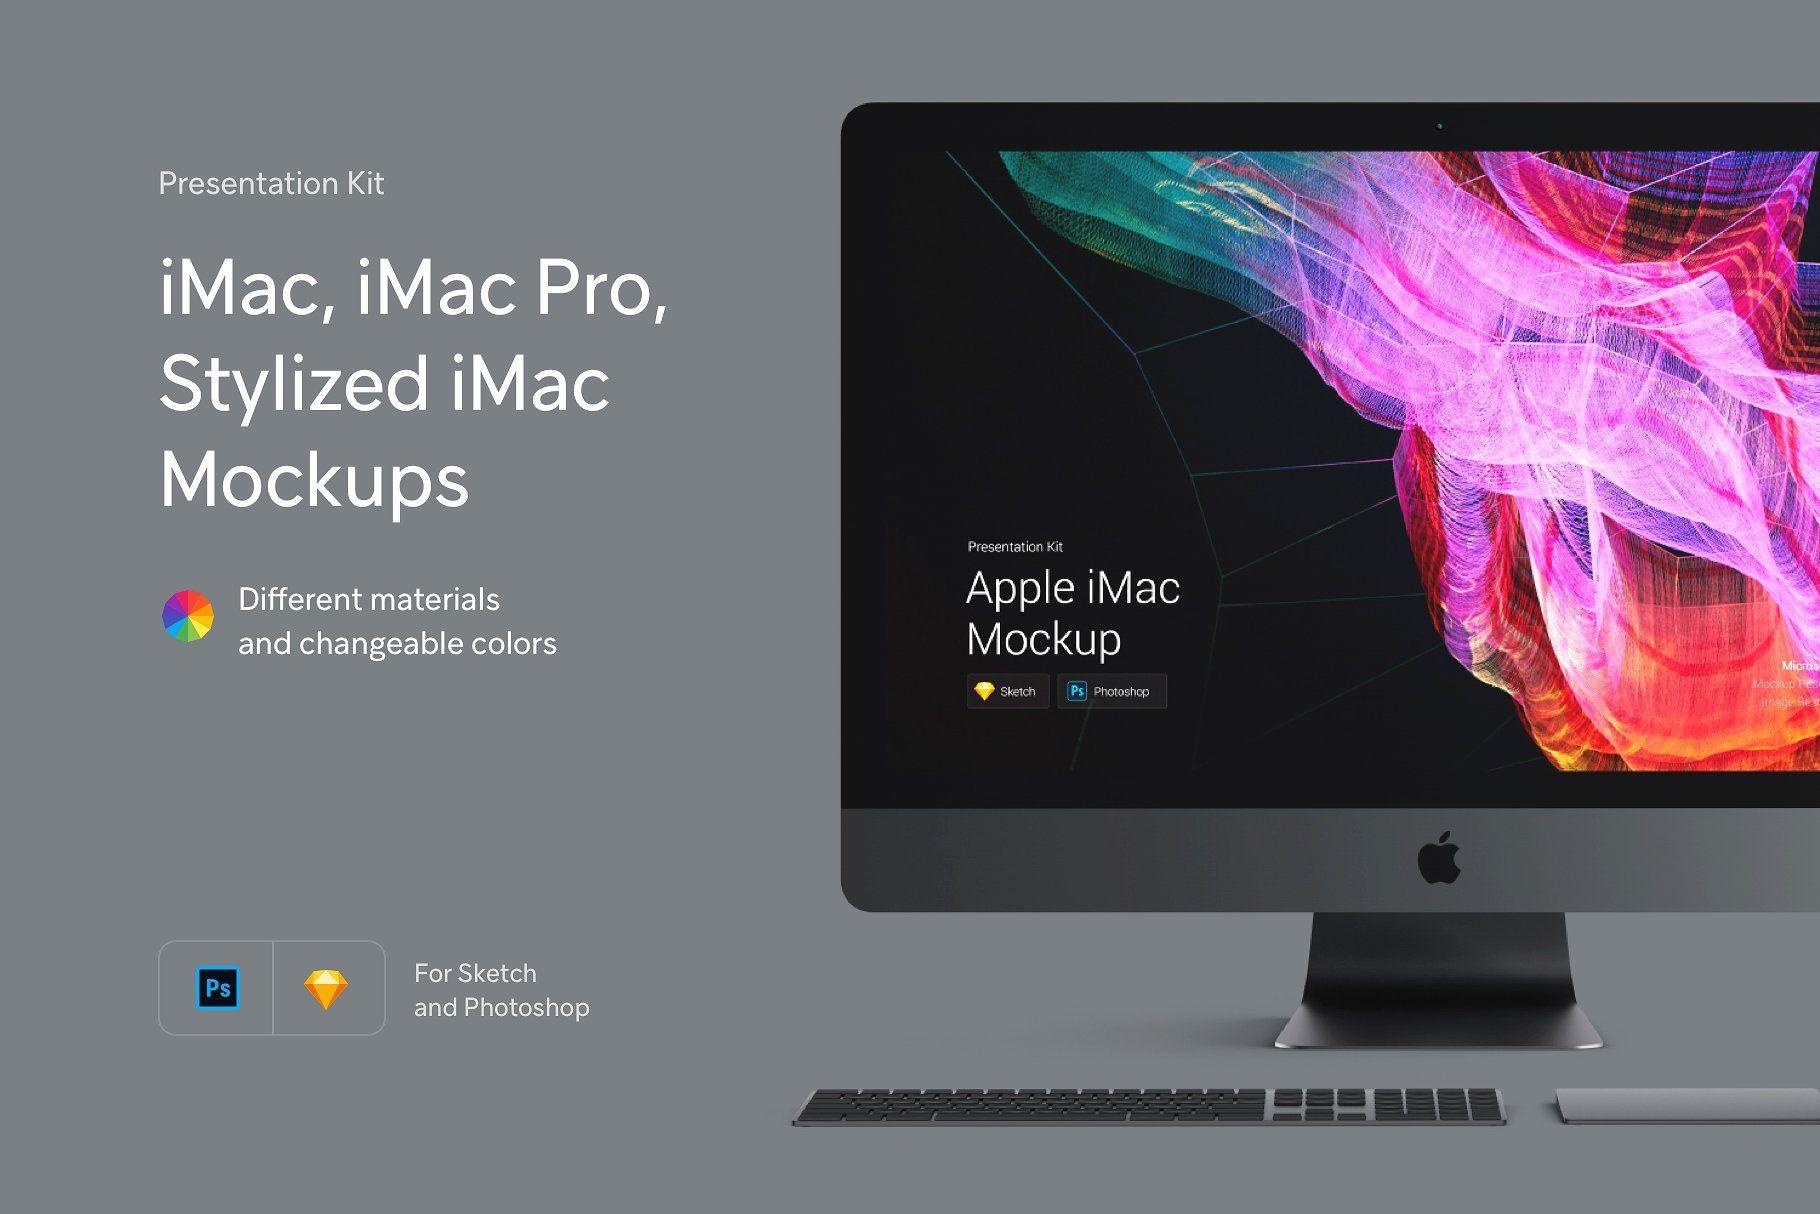 20 Apple Imac Pro Psd Mockup Templates Decolore Net Imac Psd Mockup Template Mockup Templates